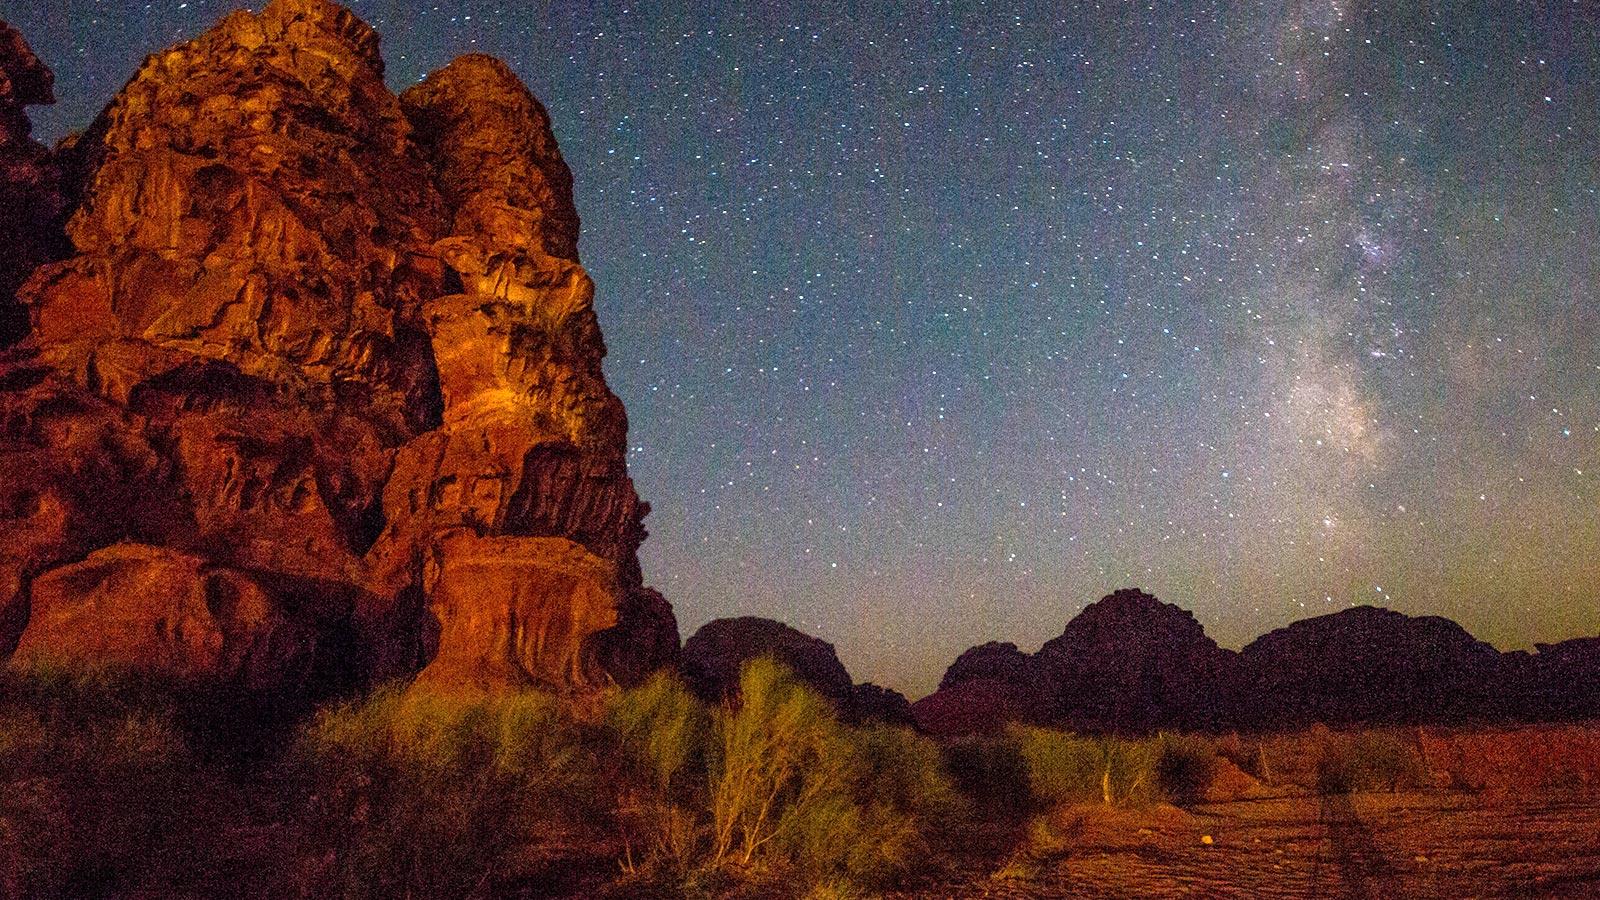 The milky way snakes across the sky of the desert in Jordan as mountains frame the shot